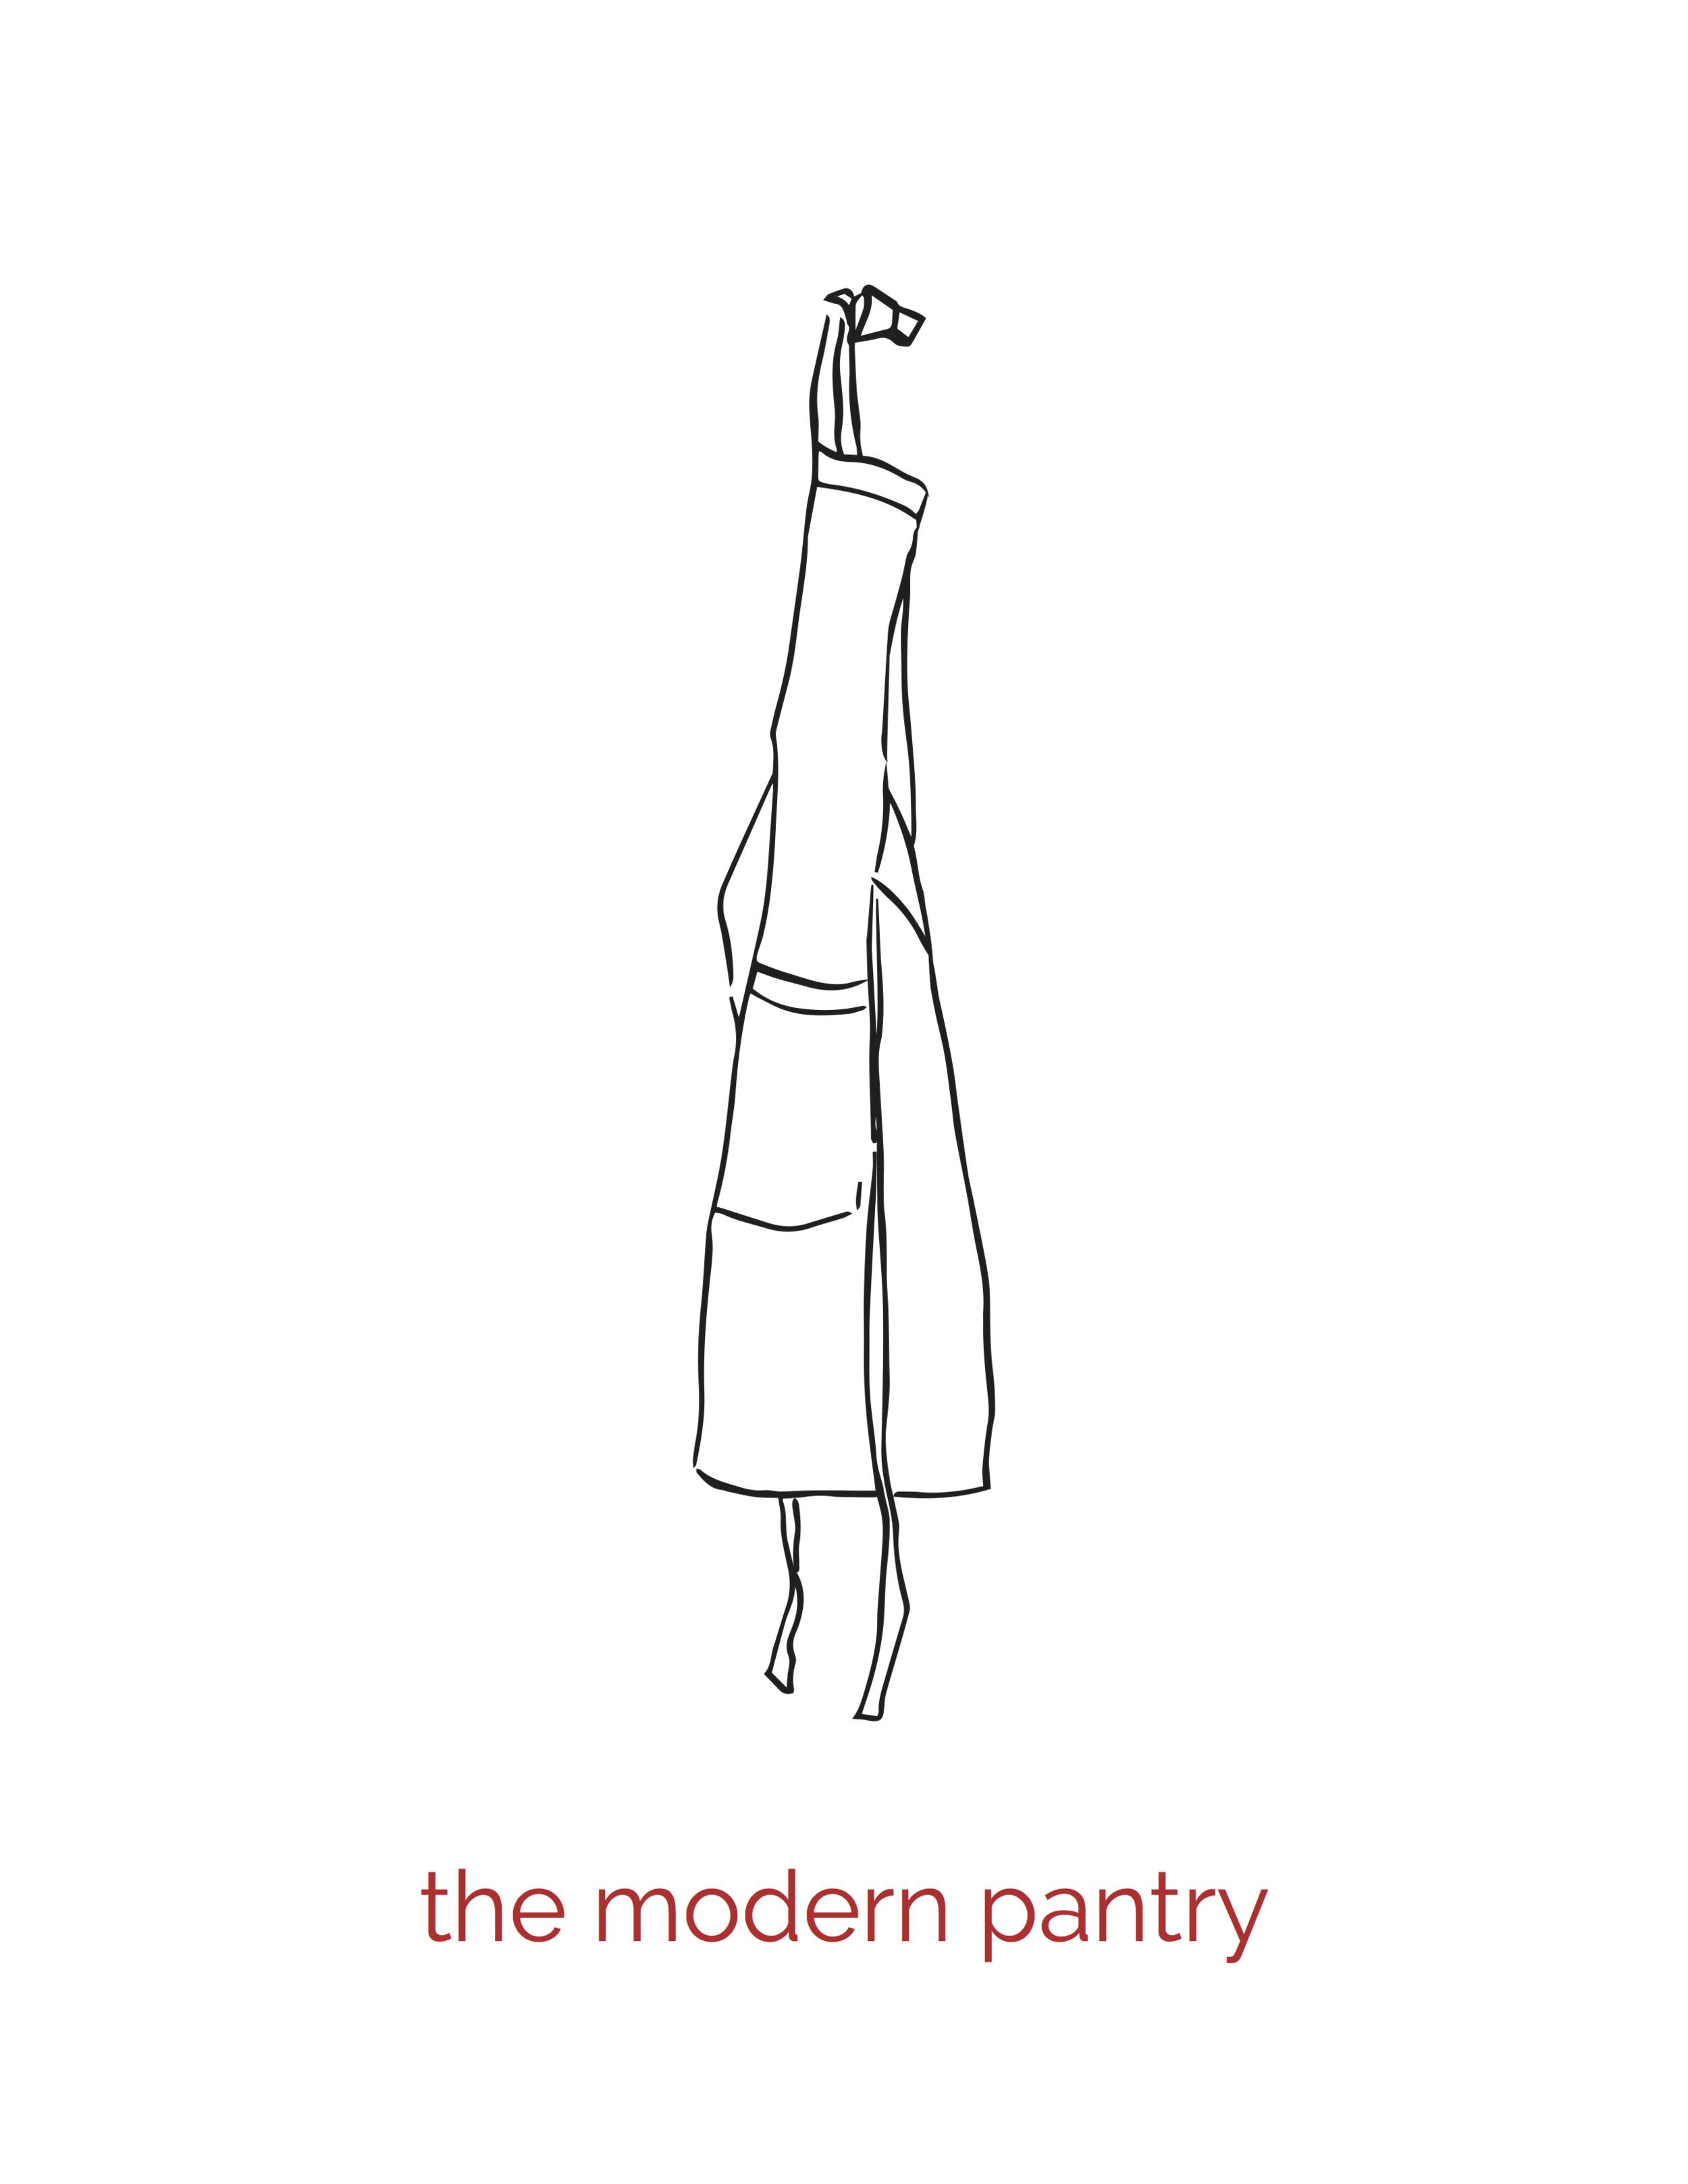 Print logo - the modern pantry.png